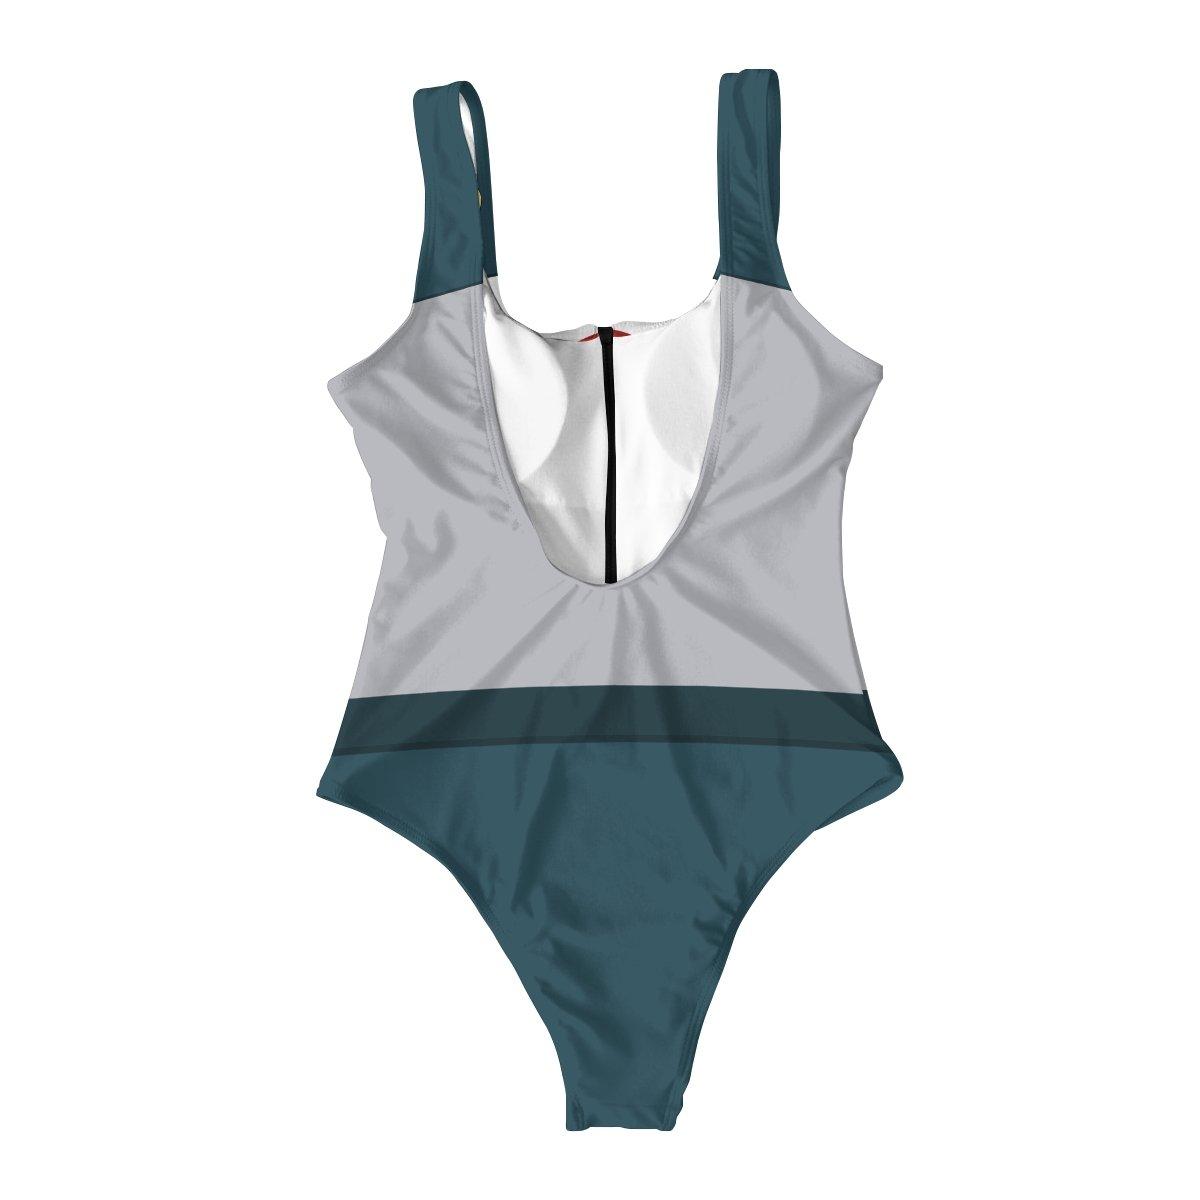 L Official Anime Swimsuit Merch